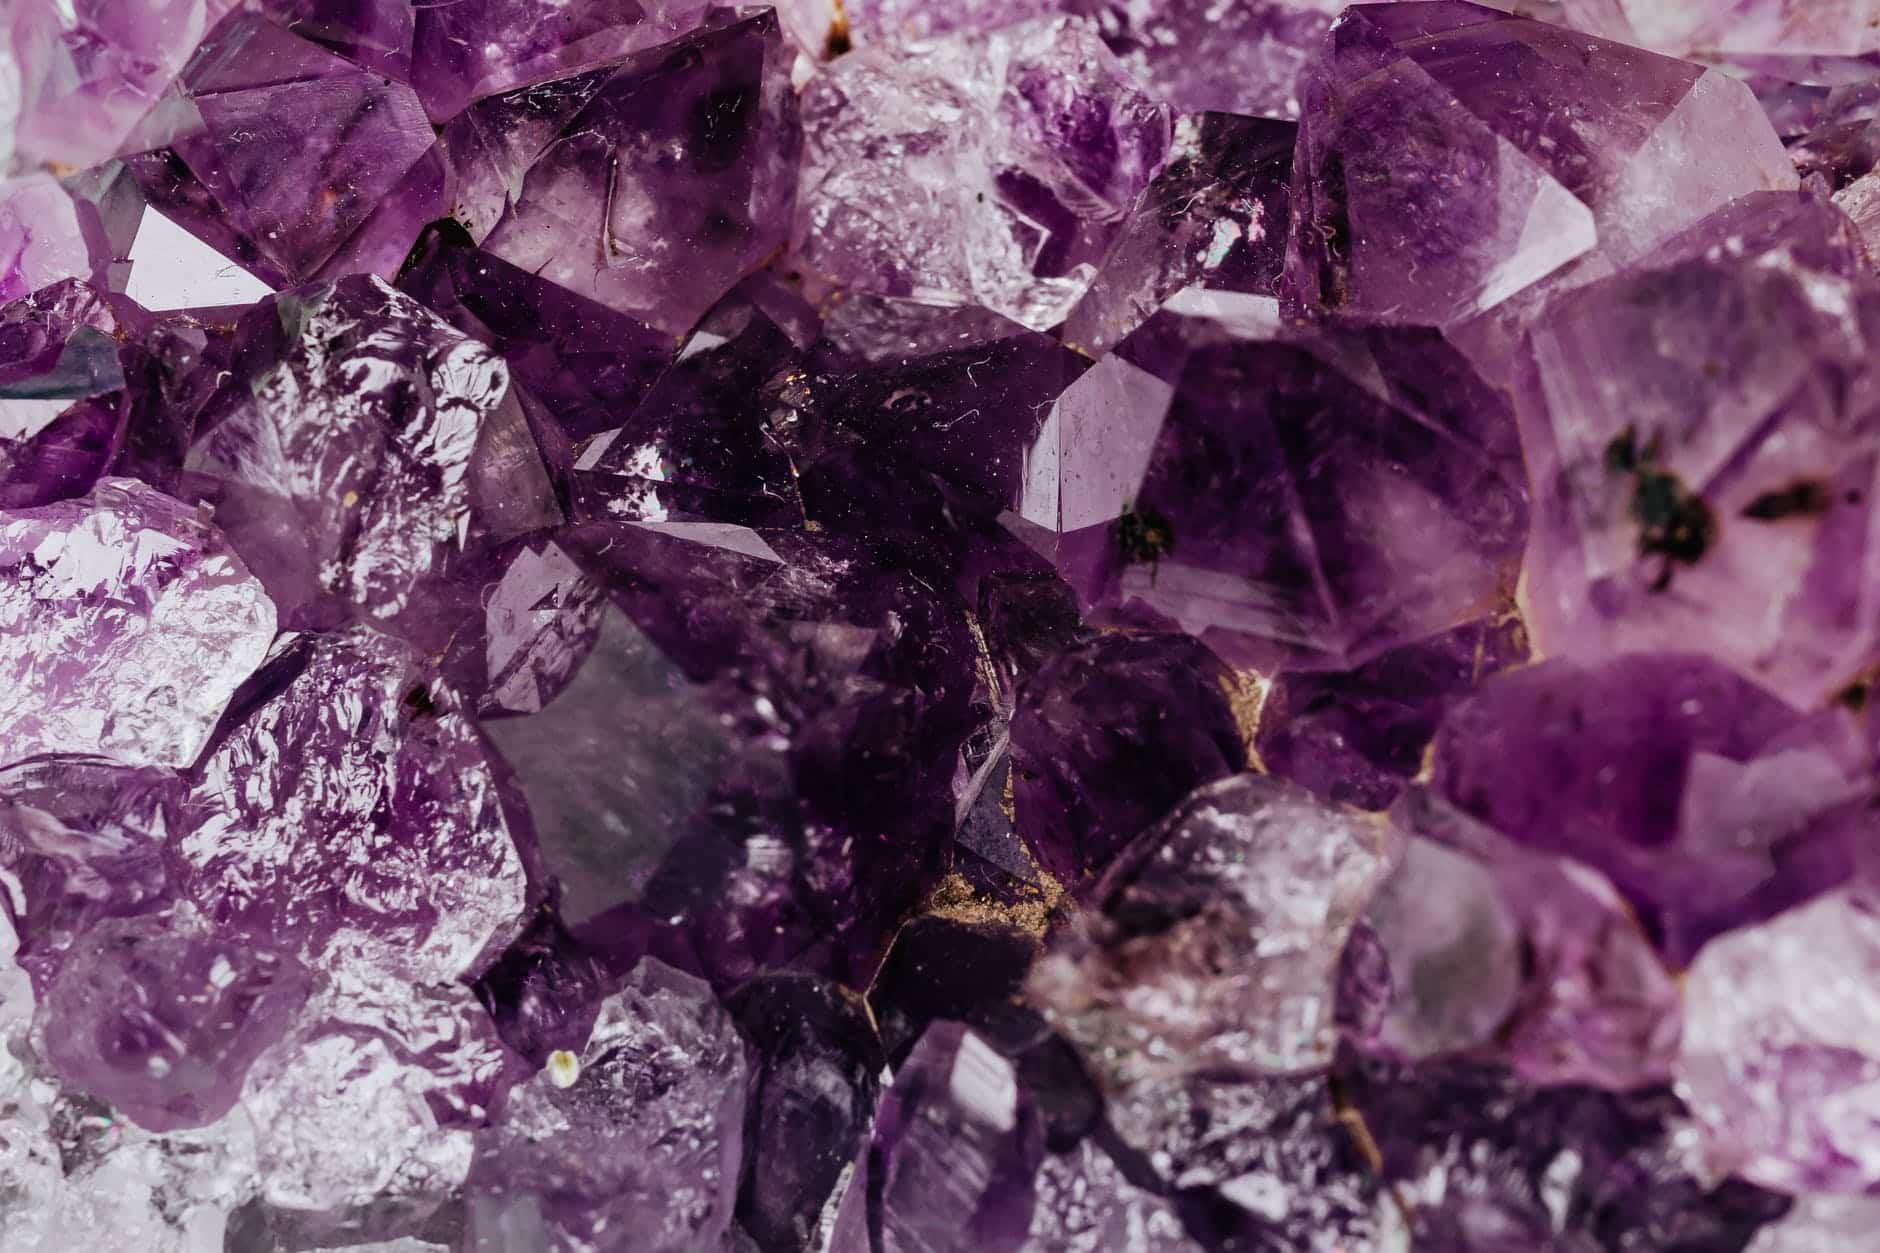 set of shiny transparent amethysts grown together